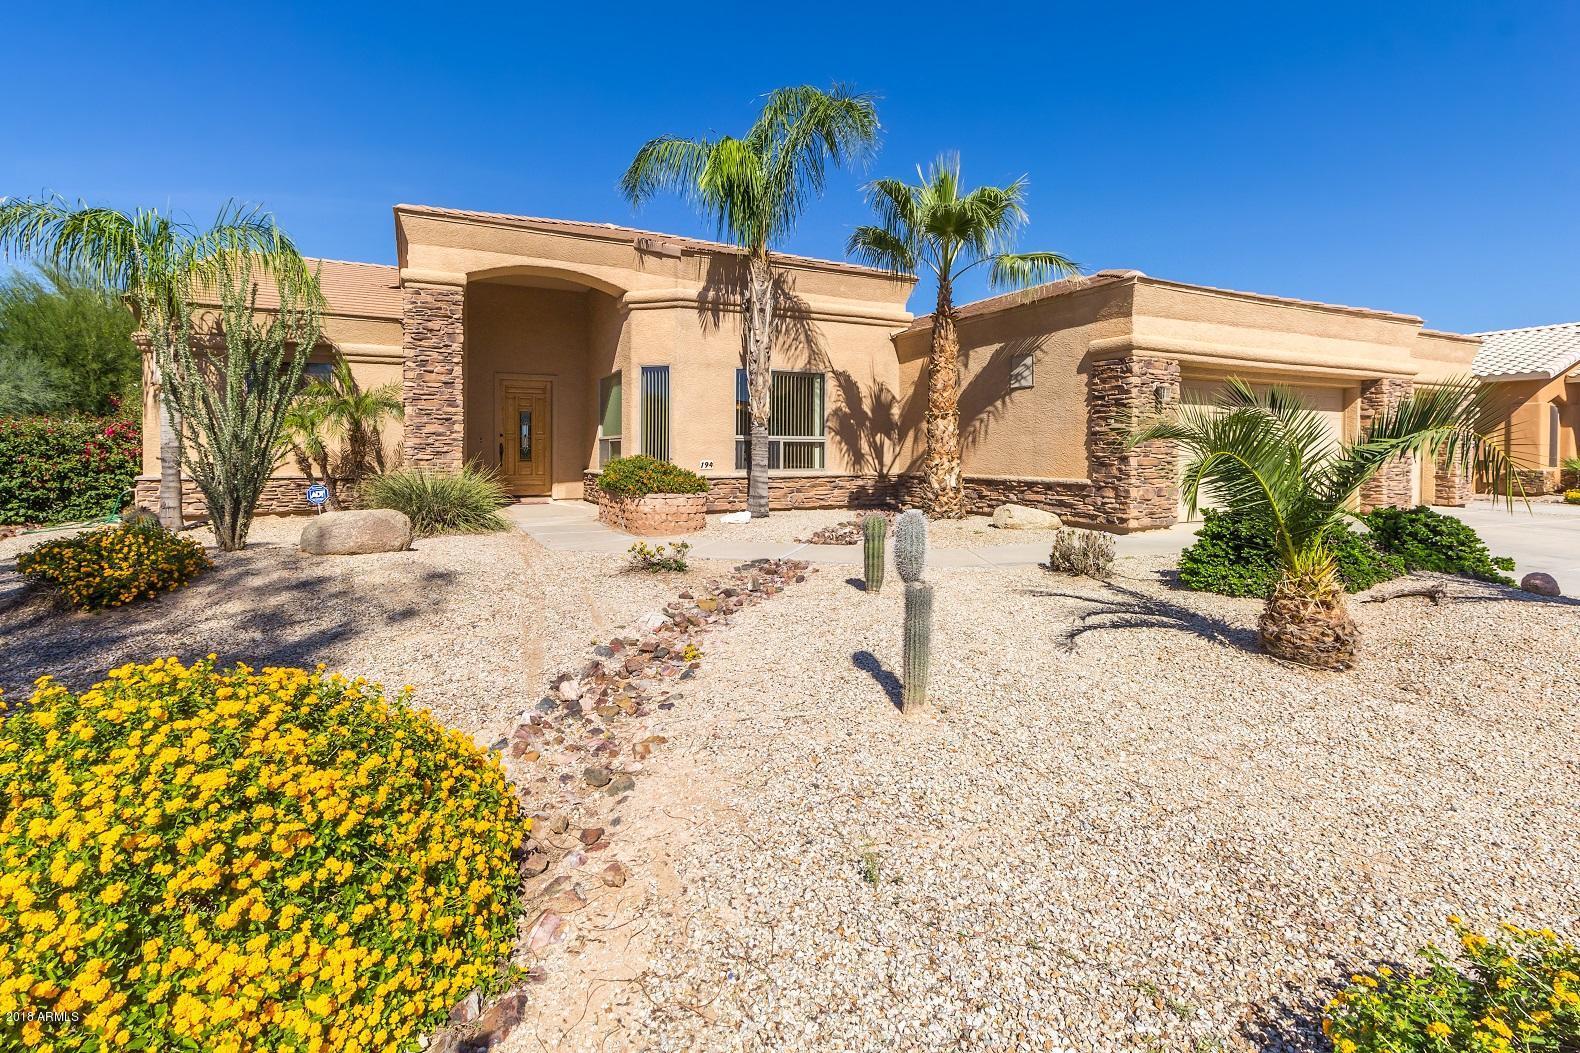 MLS 5840322 194 W CRIMSON SKY Court, Casa Grande, AZ 85122 Casa Grande AZ Three Bedroom